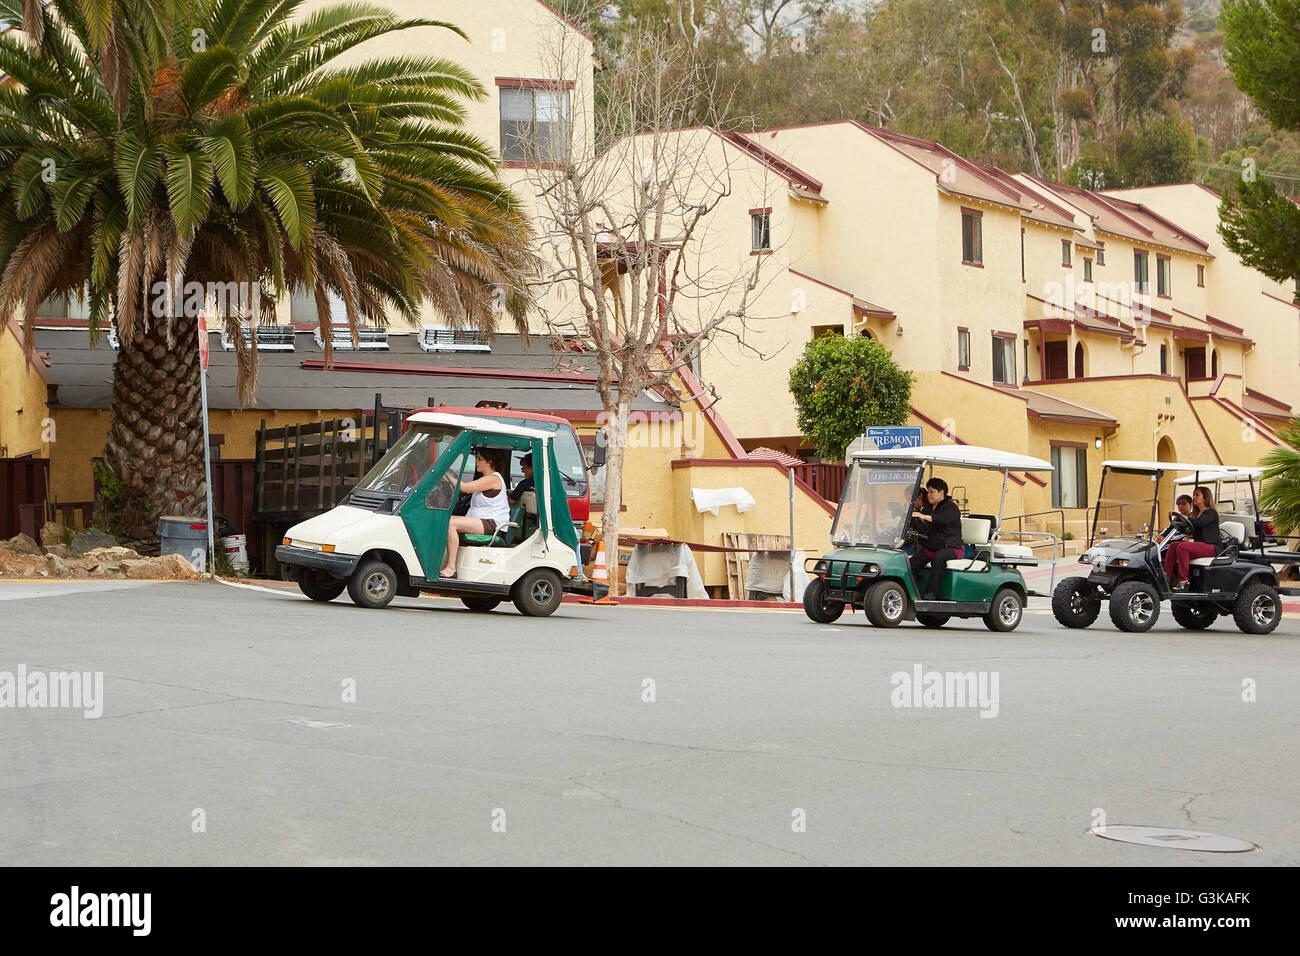 Morning School Run Of Golf Carts In Avalon, Santa Catalina Island, California. - Stock Image